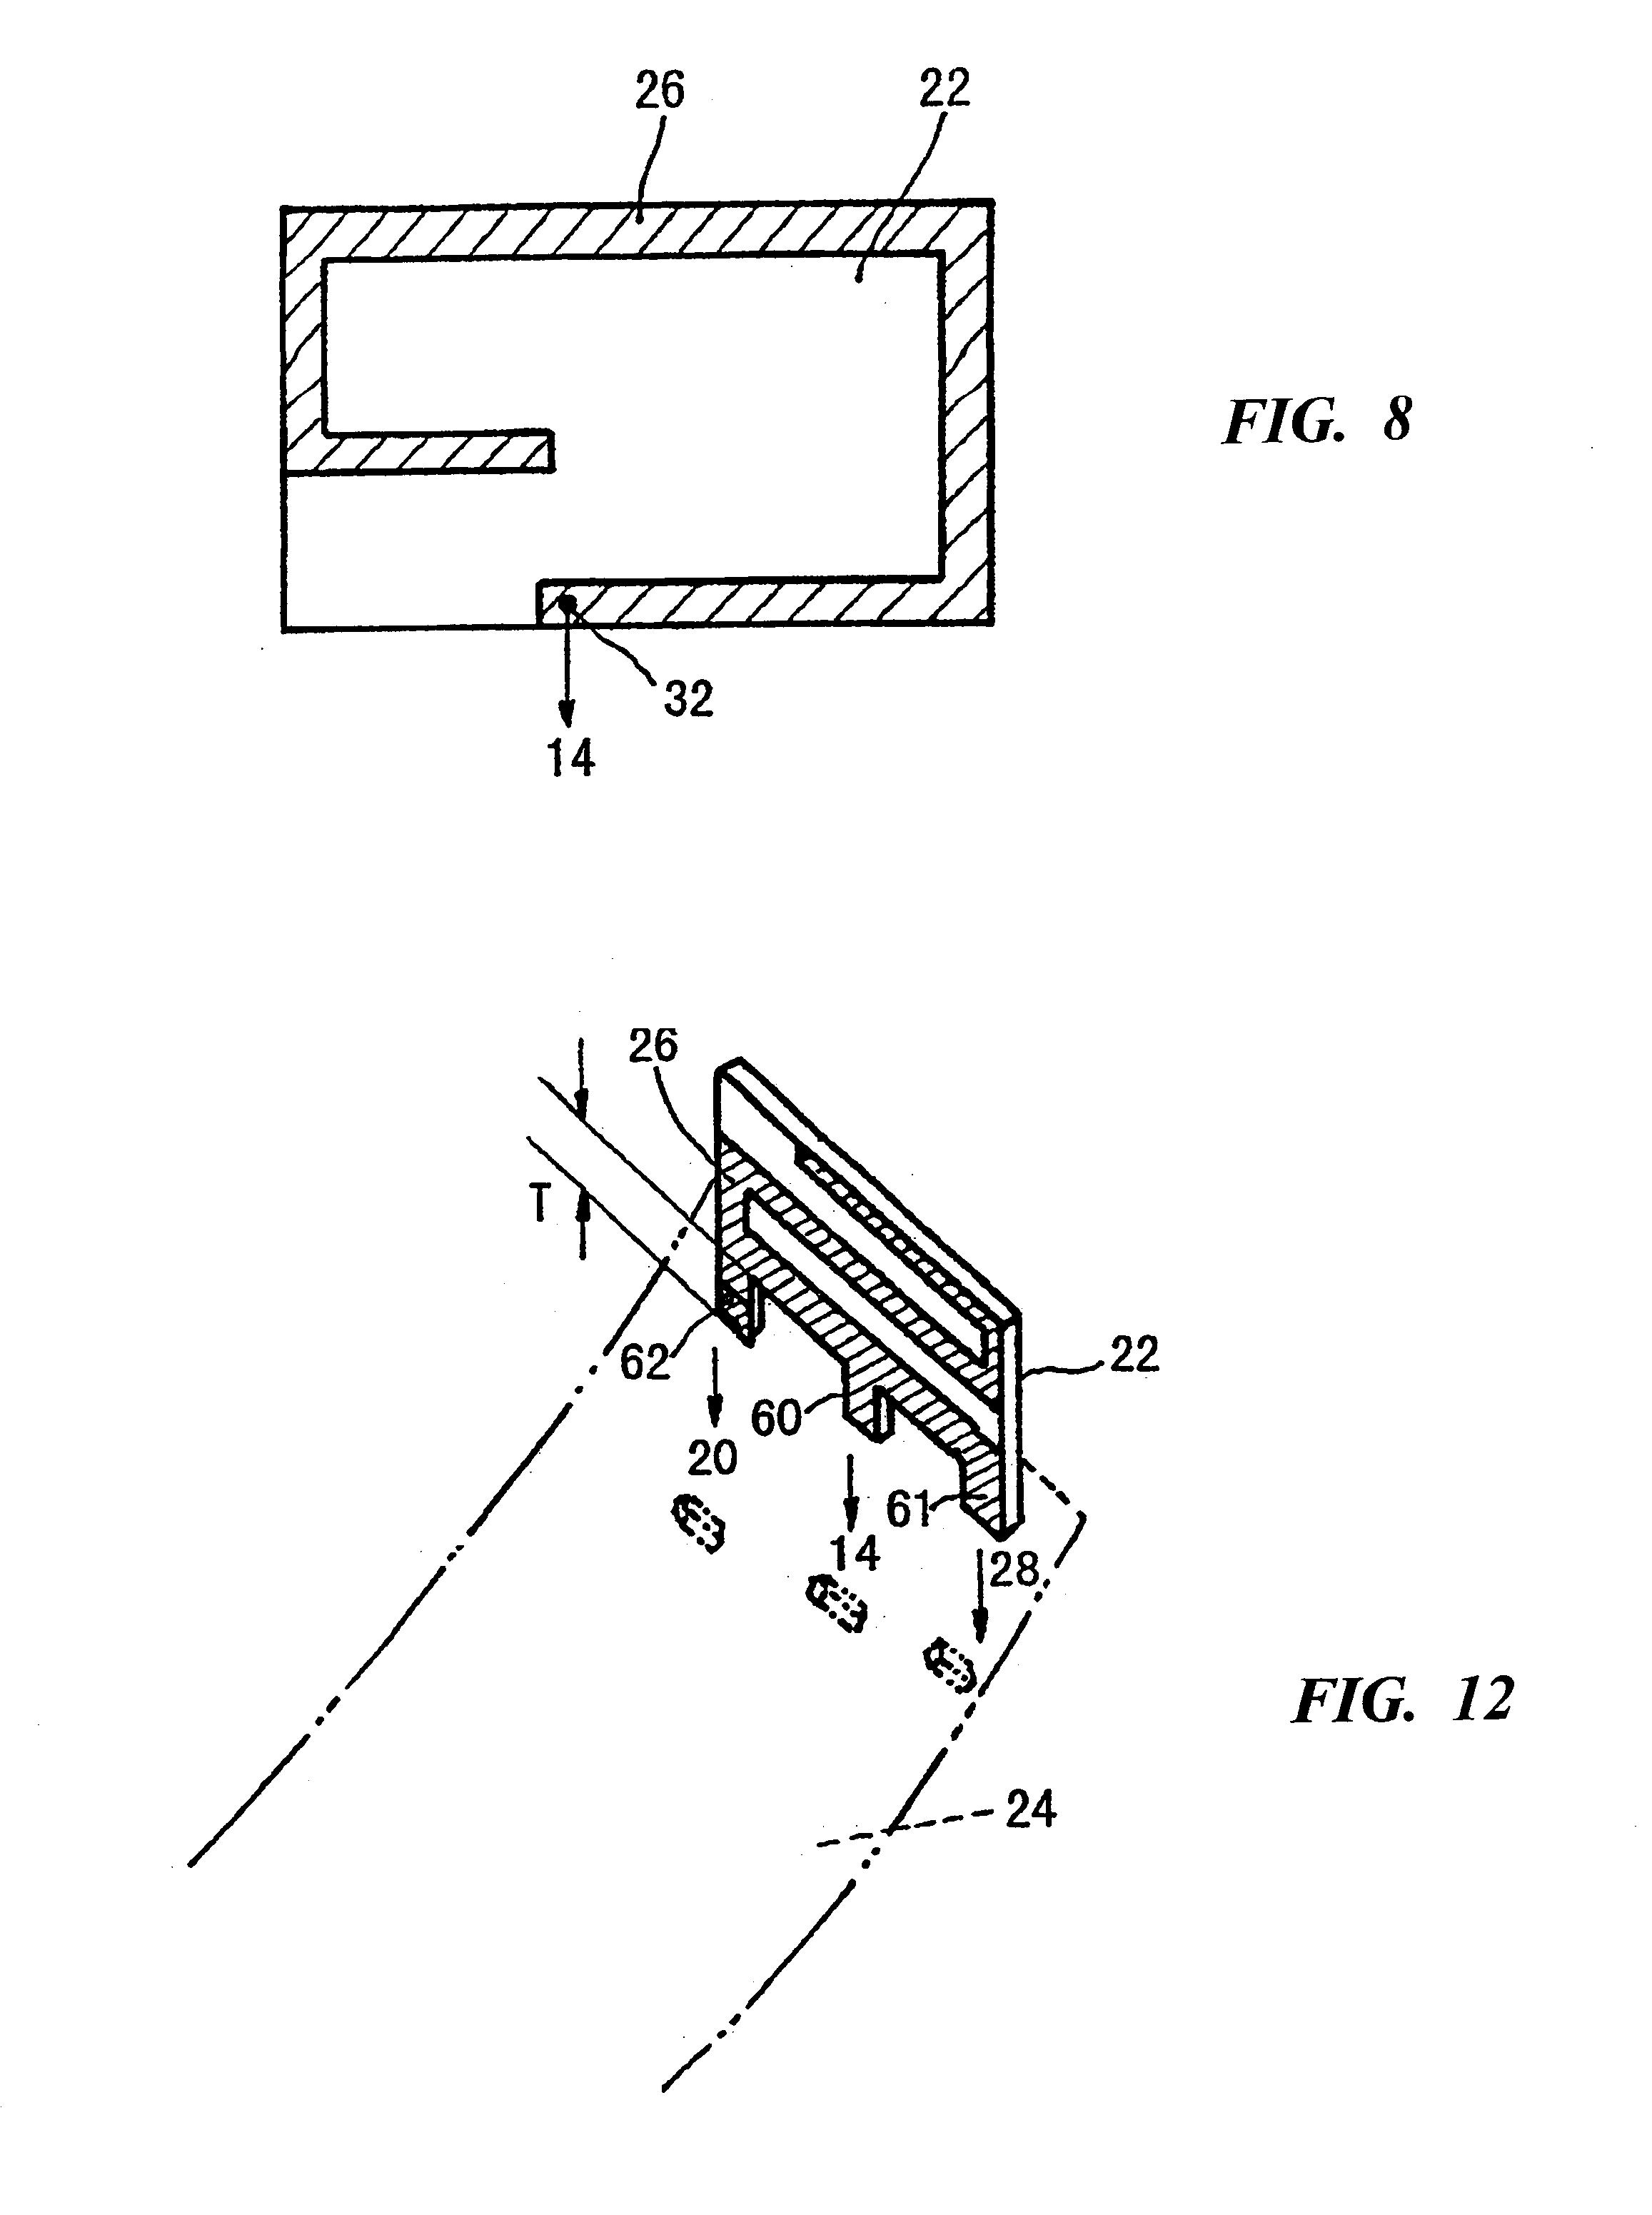 Patent US 6,239,765 B1 on